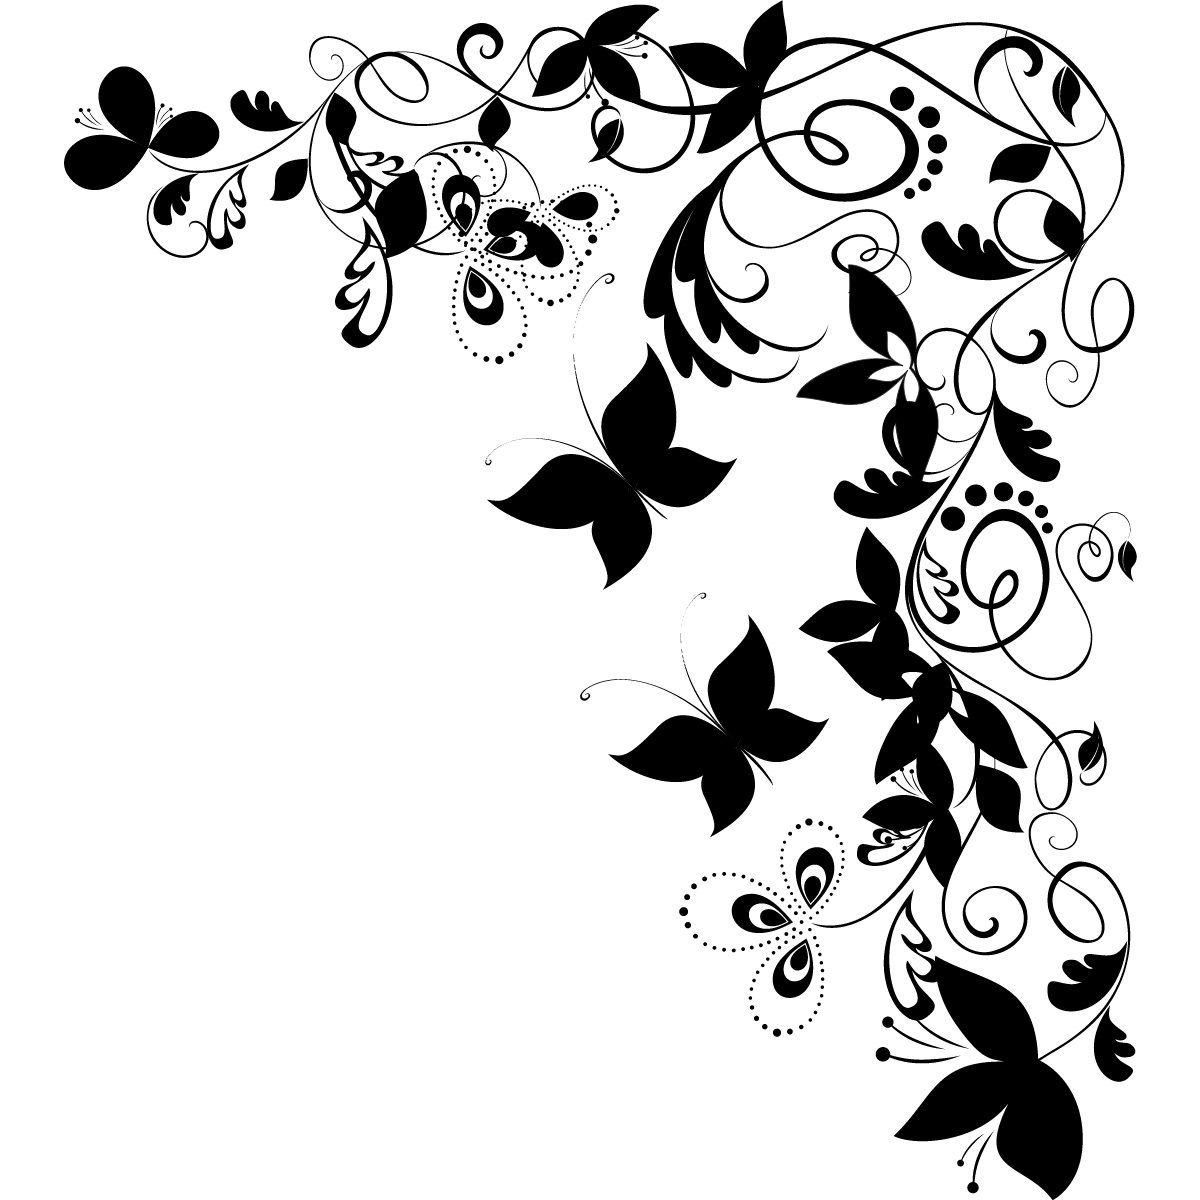 8 Butterfly Corner Border Designs Images